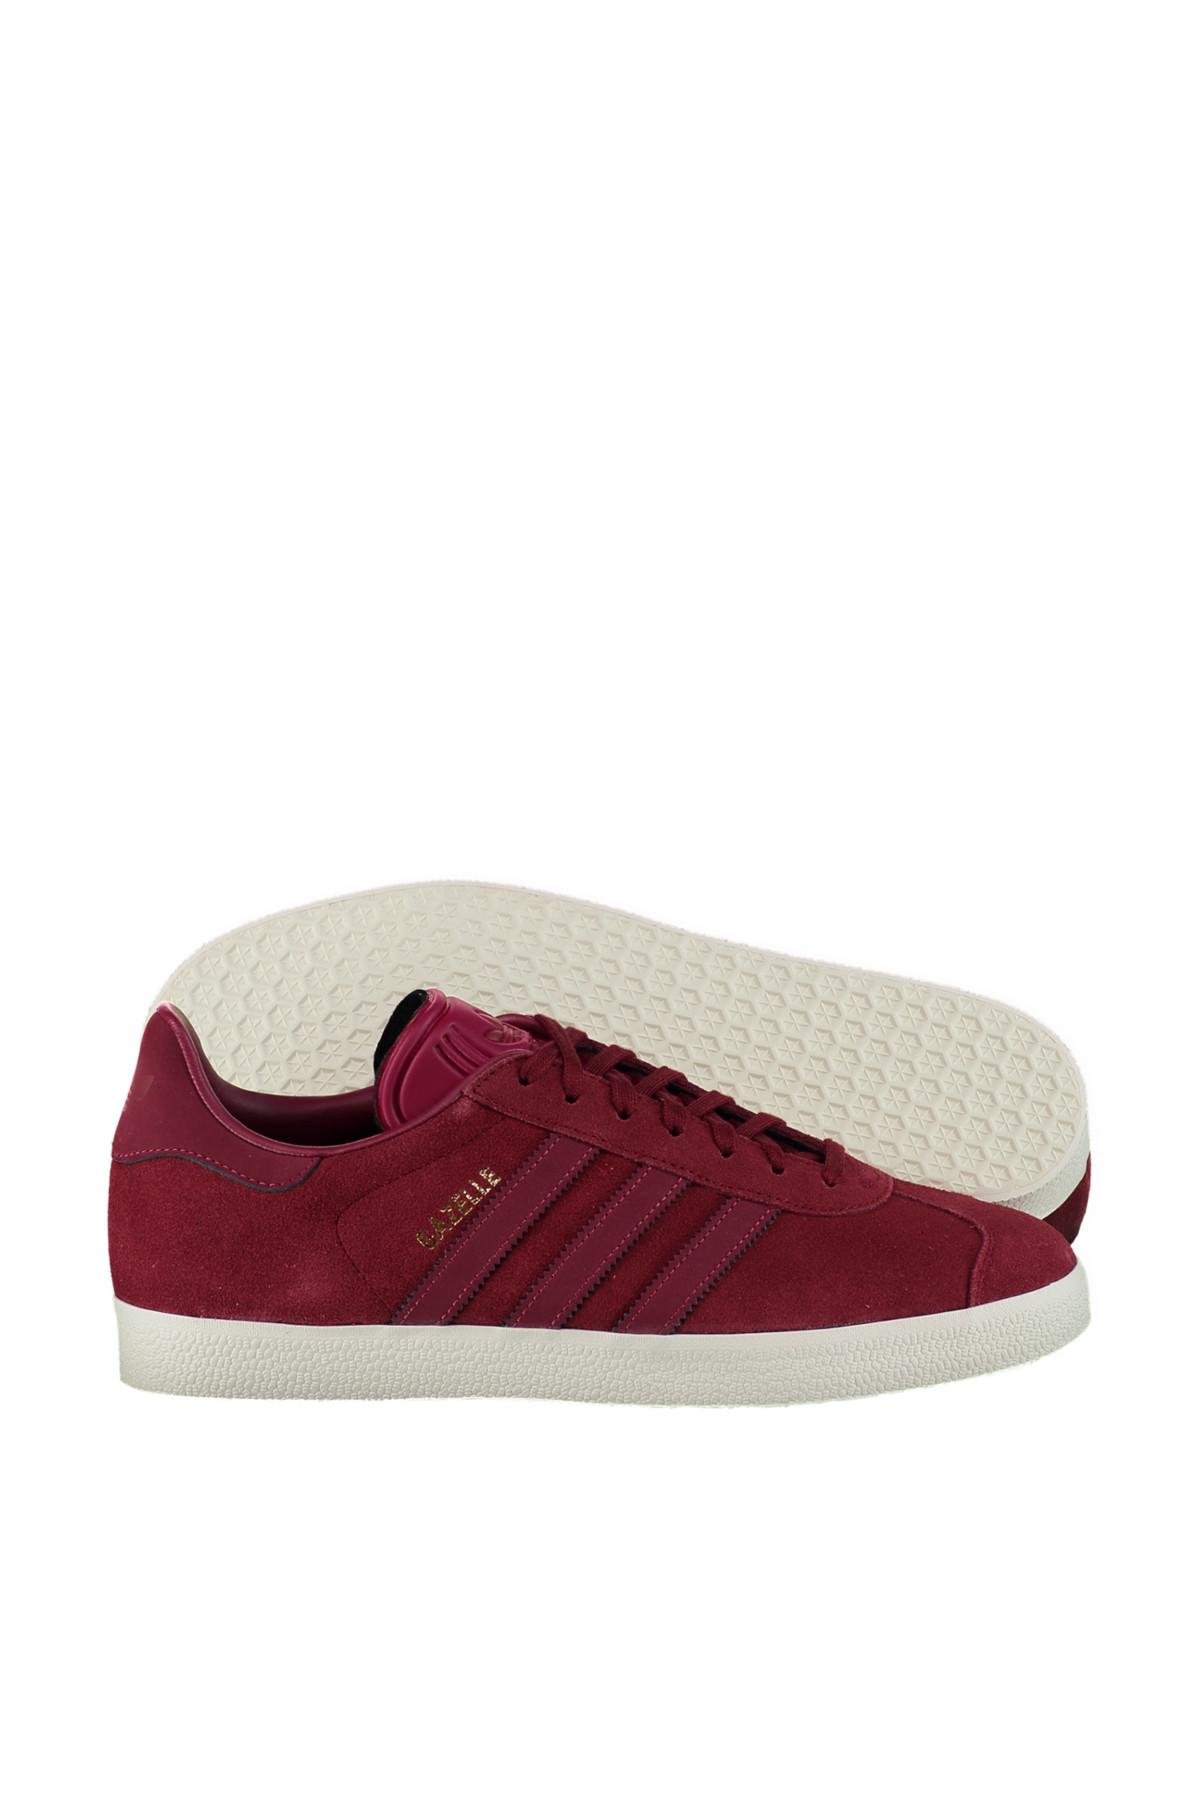 adidas Erkek Originals Spor Ayakkabı - Gazelle - BZ0030 1